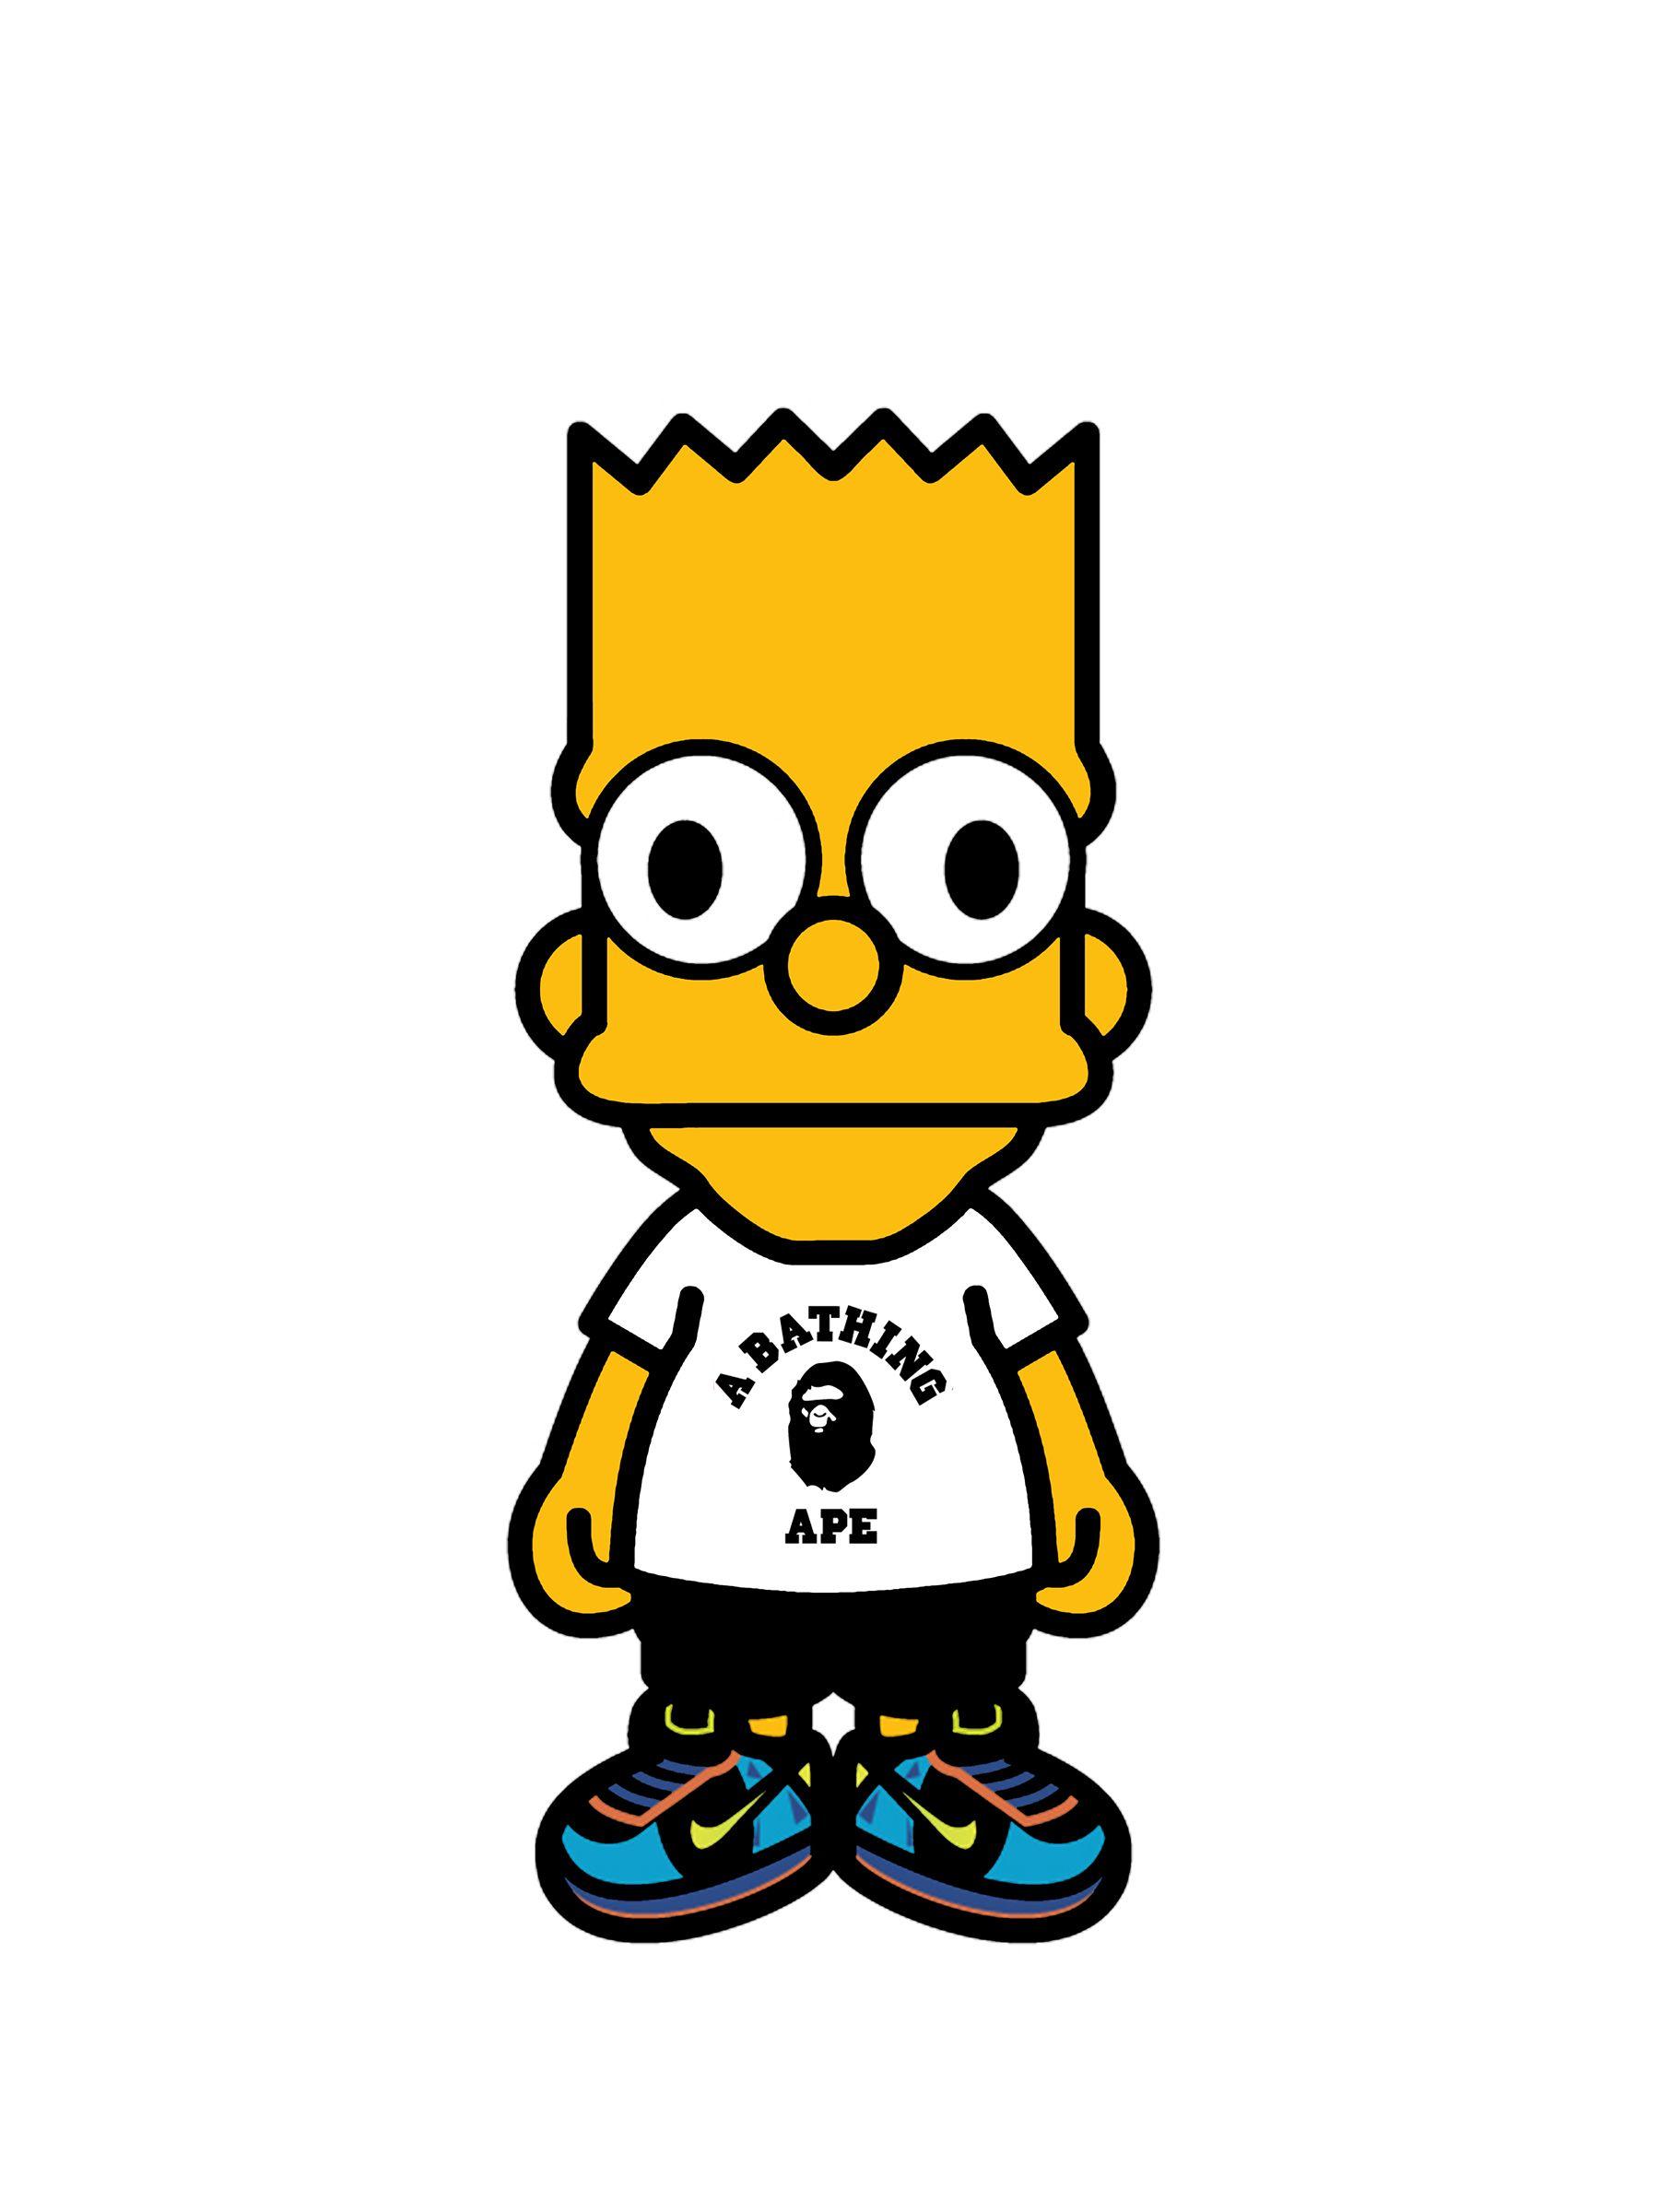 Bart Simpson Bape Poster Bart Simpson Minimalist Poster Bape Cartoon